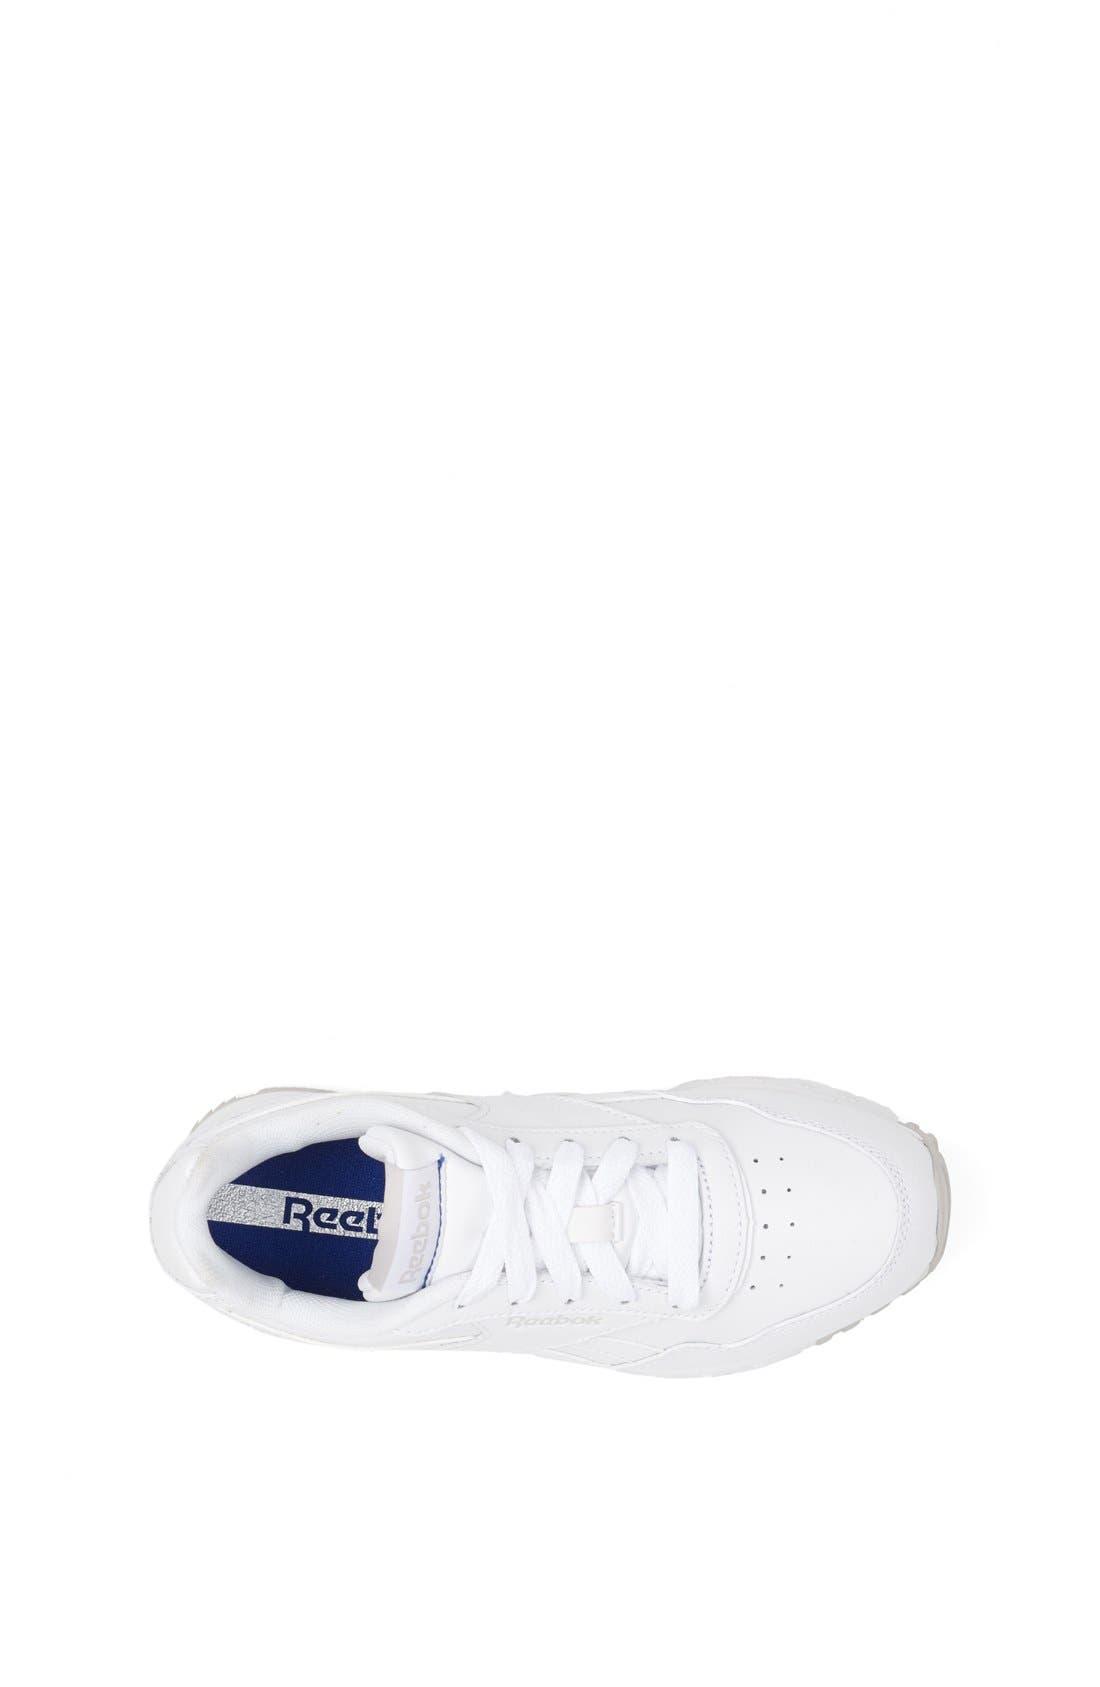 Alternate Image 3  - Reebok 'Royal Glide' Sneaker (Baby, Walker, Toddler, Little Kid & Big Kid)